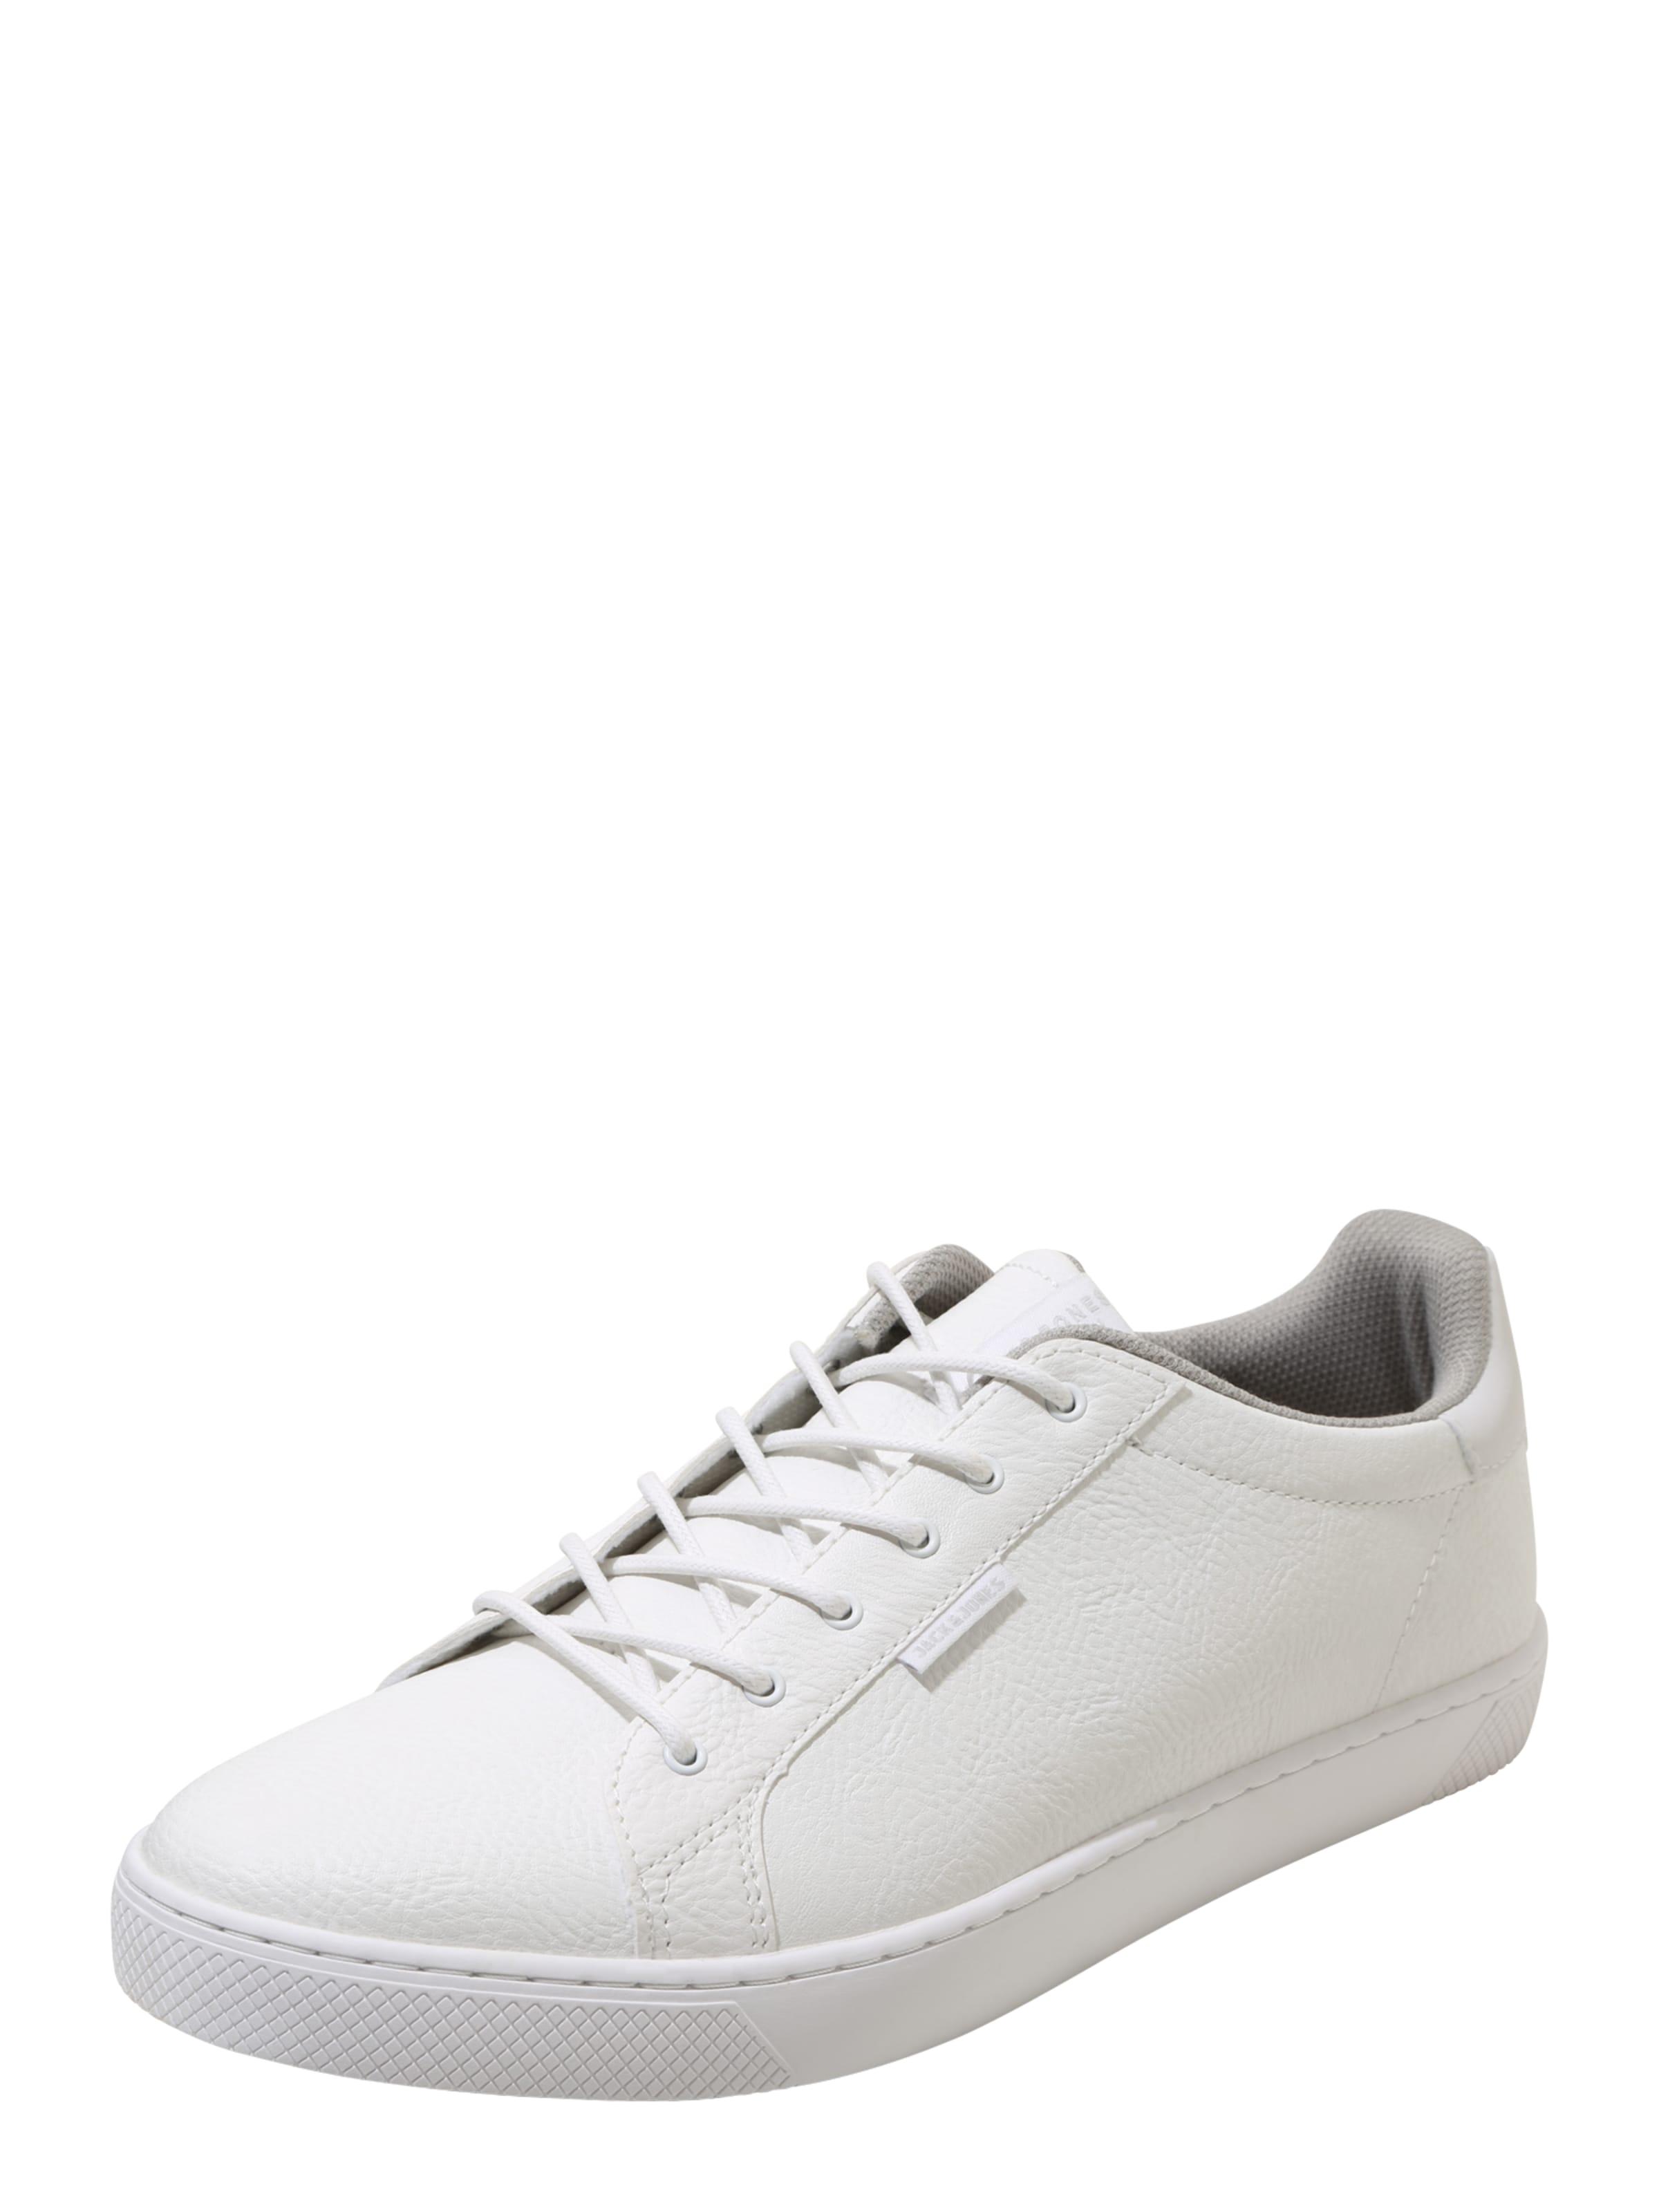 JACK & JONES Sneaker JFWTRENT Hohe Qualität